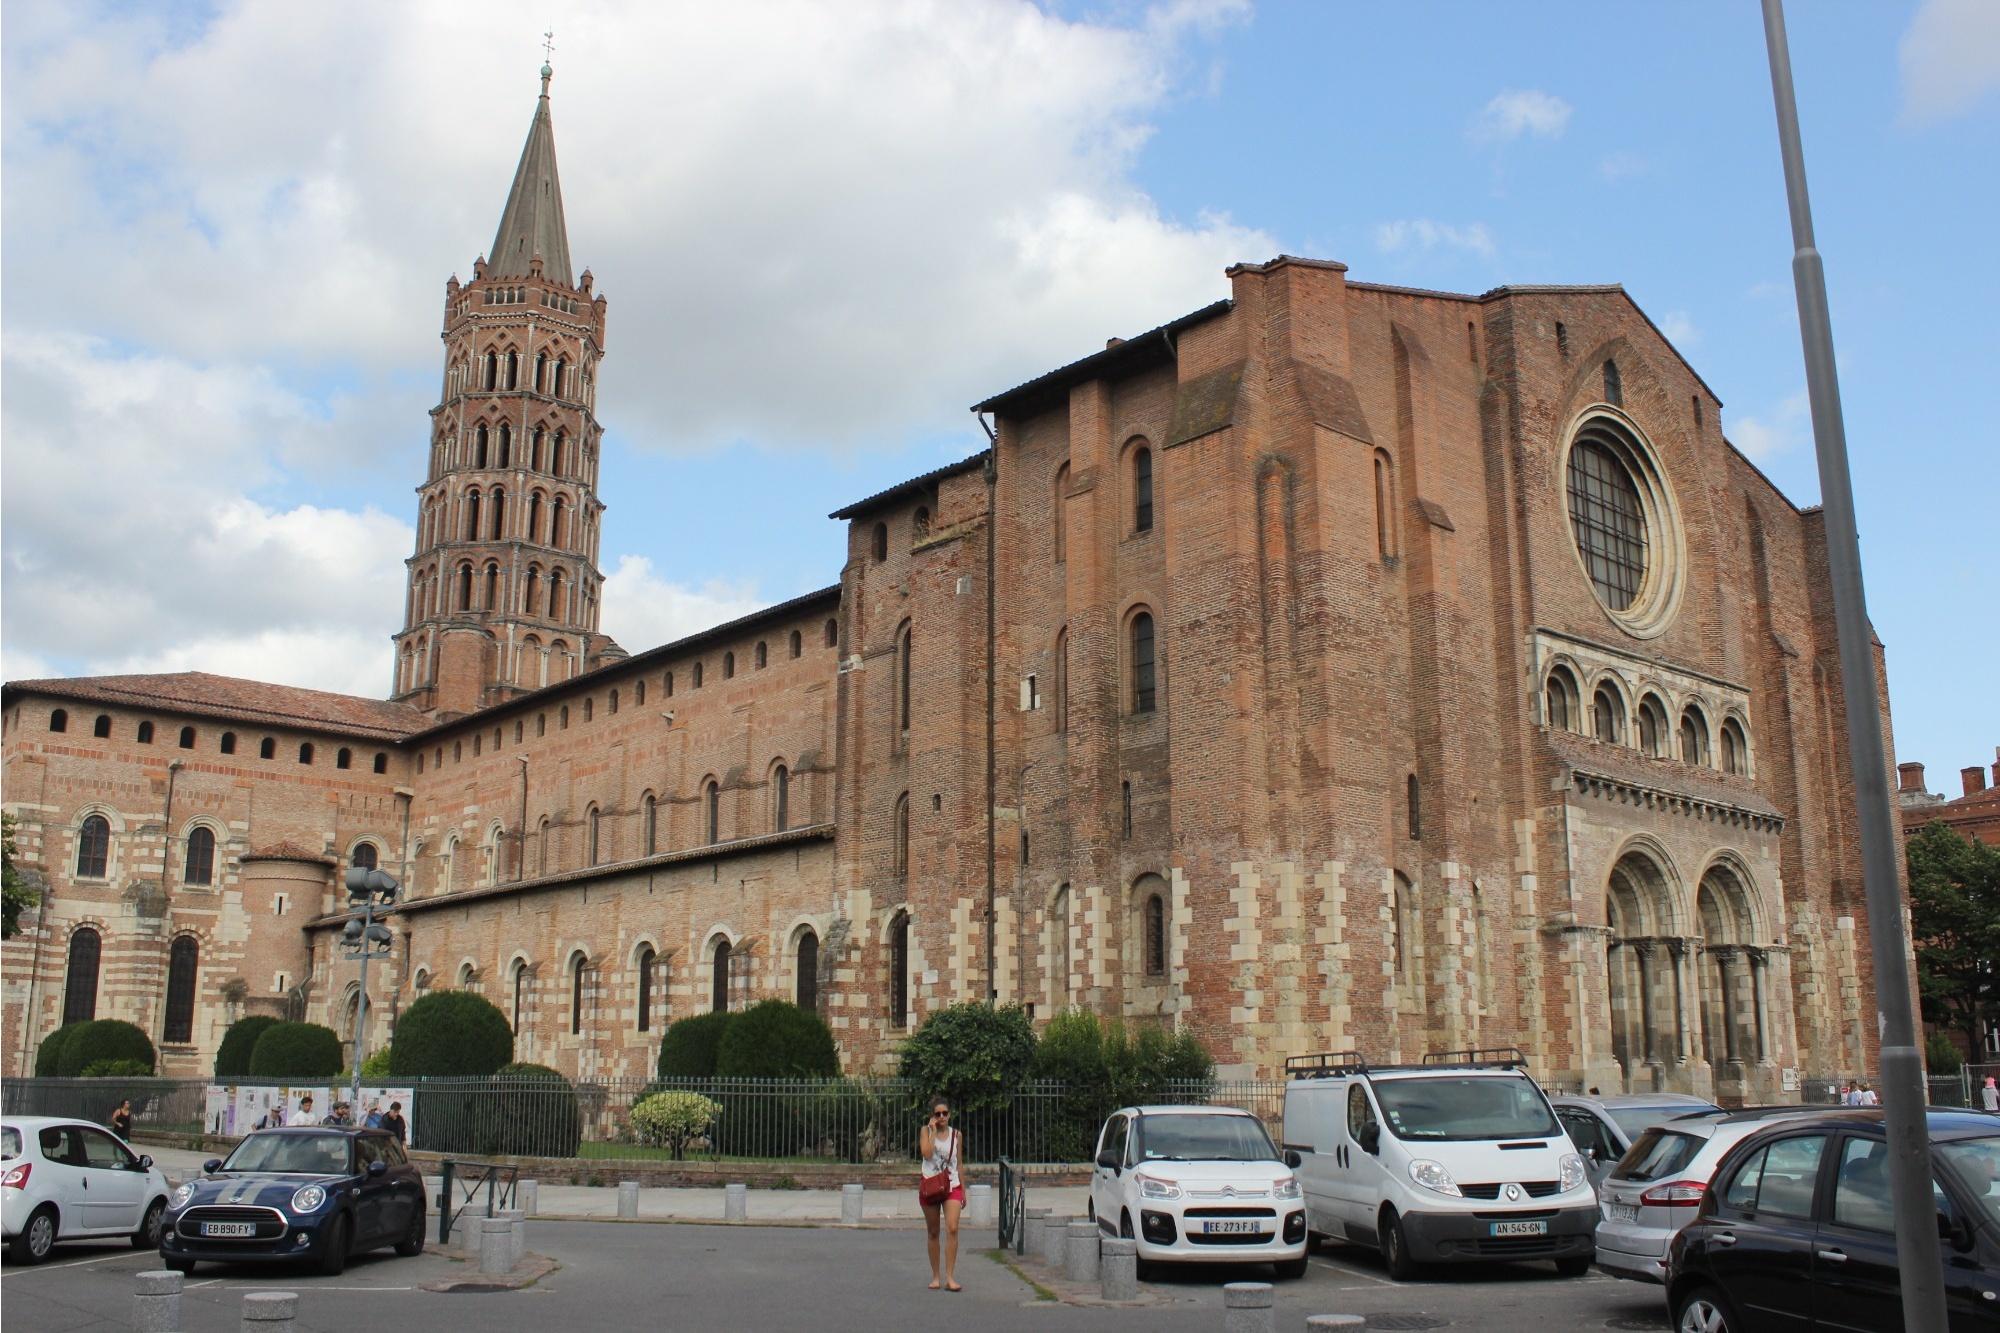 Собор Сен-Сернен в Тулузе (строительство началось ещё в XI веке)